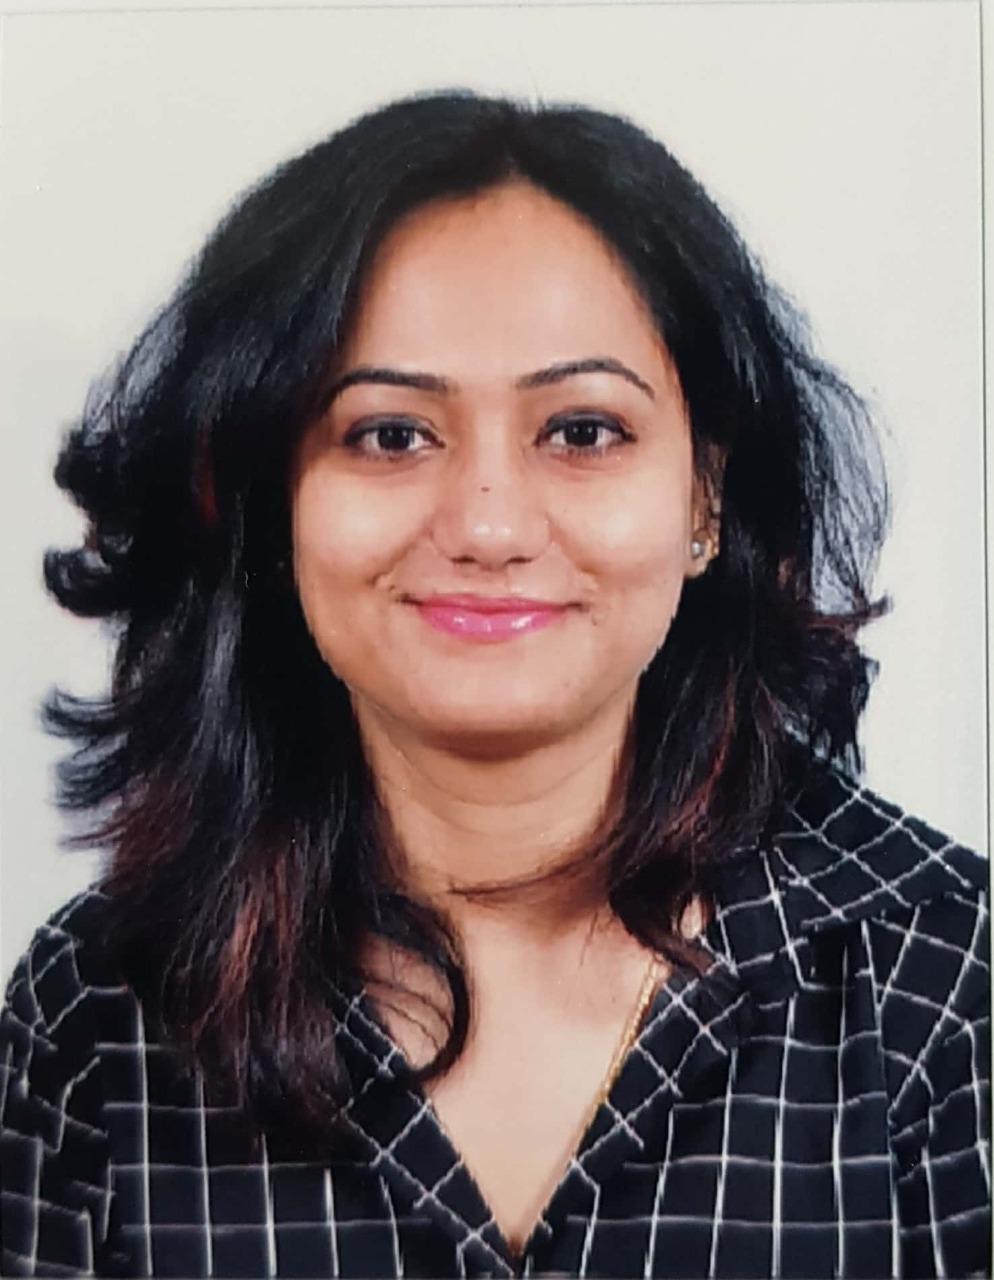 Brishty Srivastava